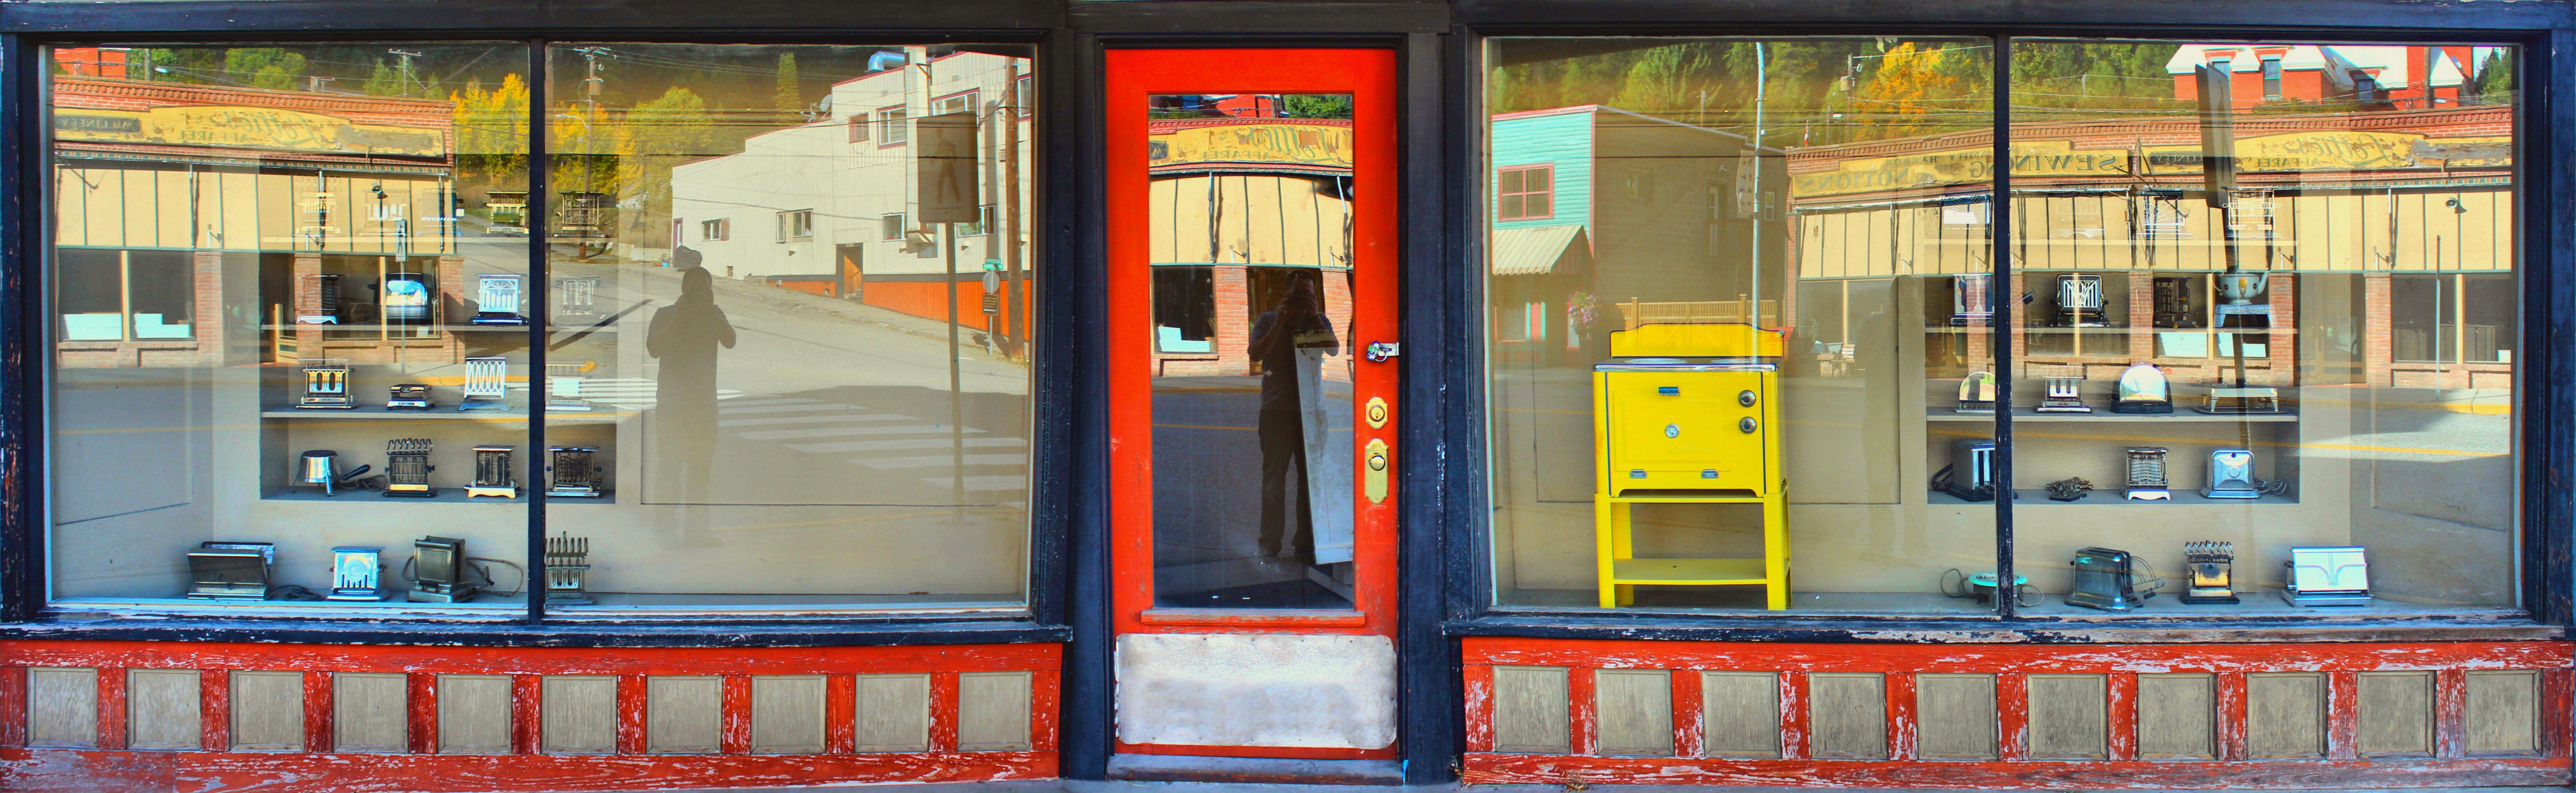 images gratuites cru restaurant vieux panorama panoramique le magasin couleur fa ade. Black Bedroom Furniture Sets. Home Design Ideas